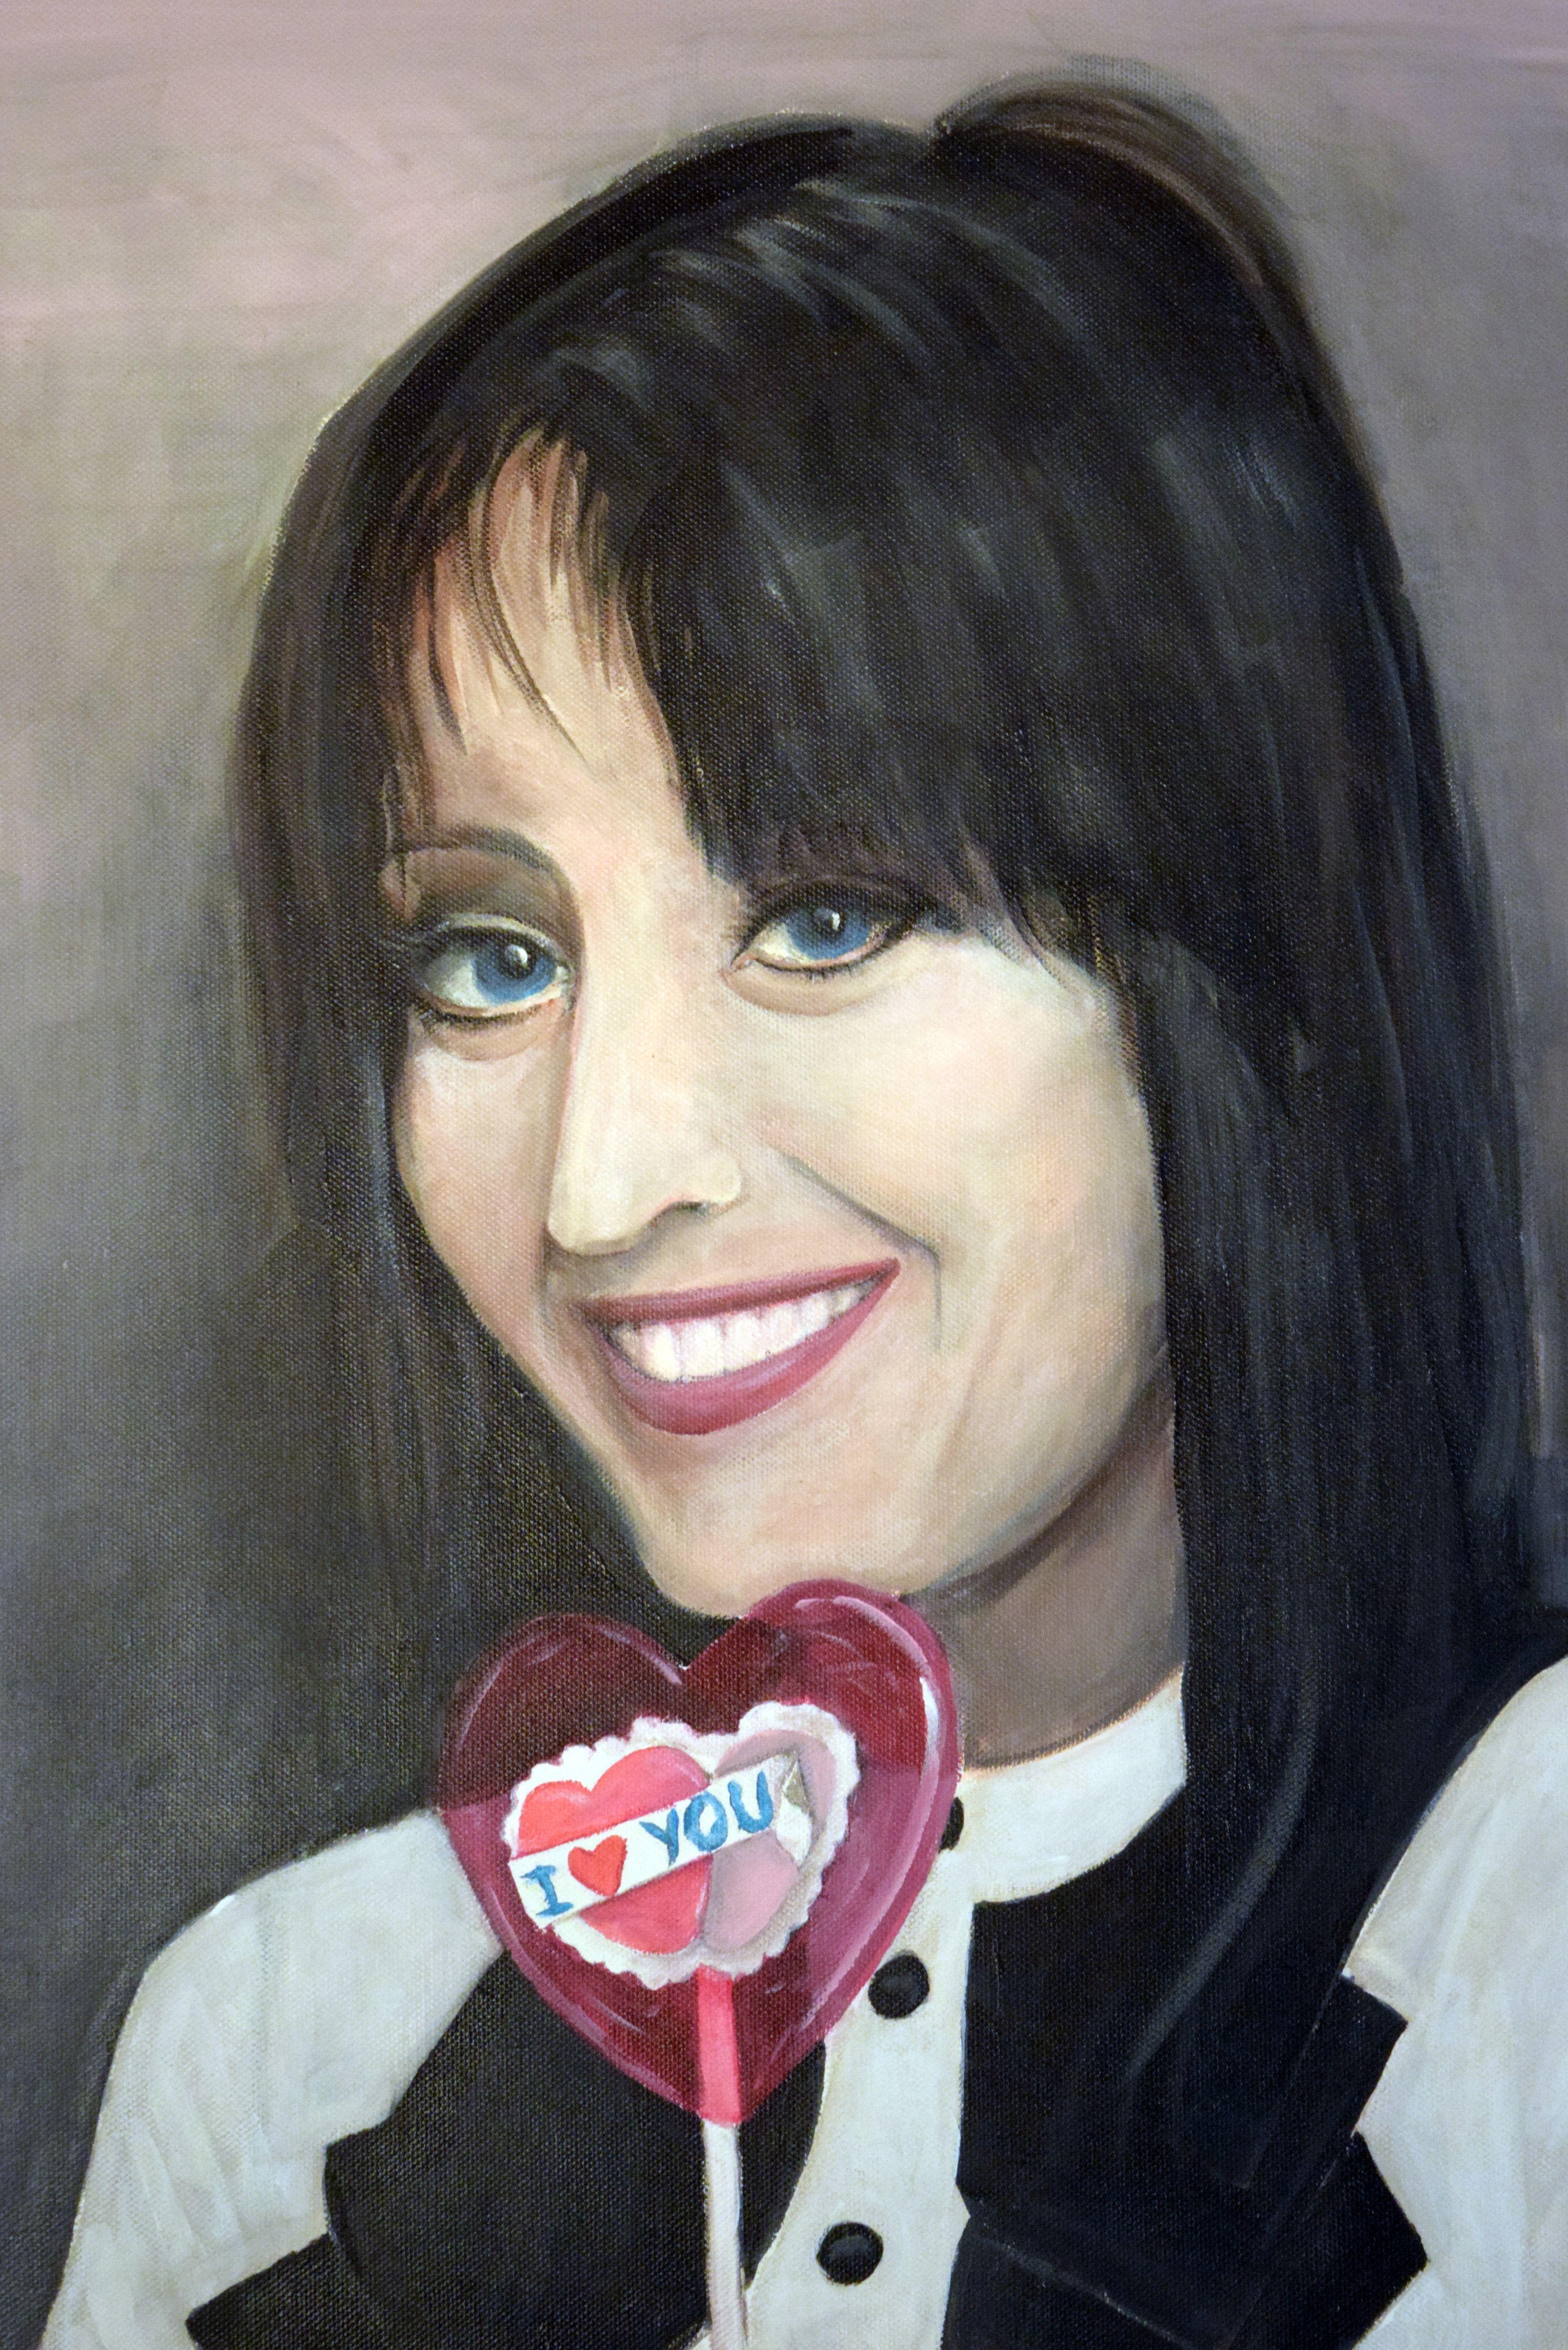 Katy hudson christian music